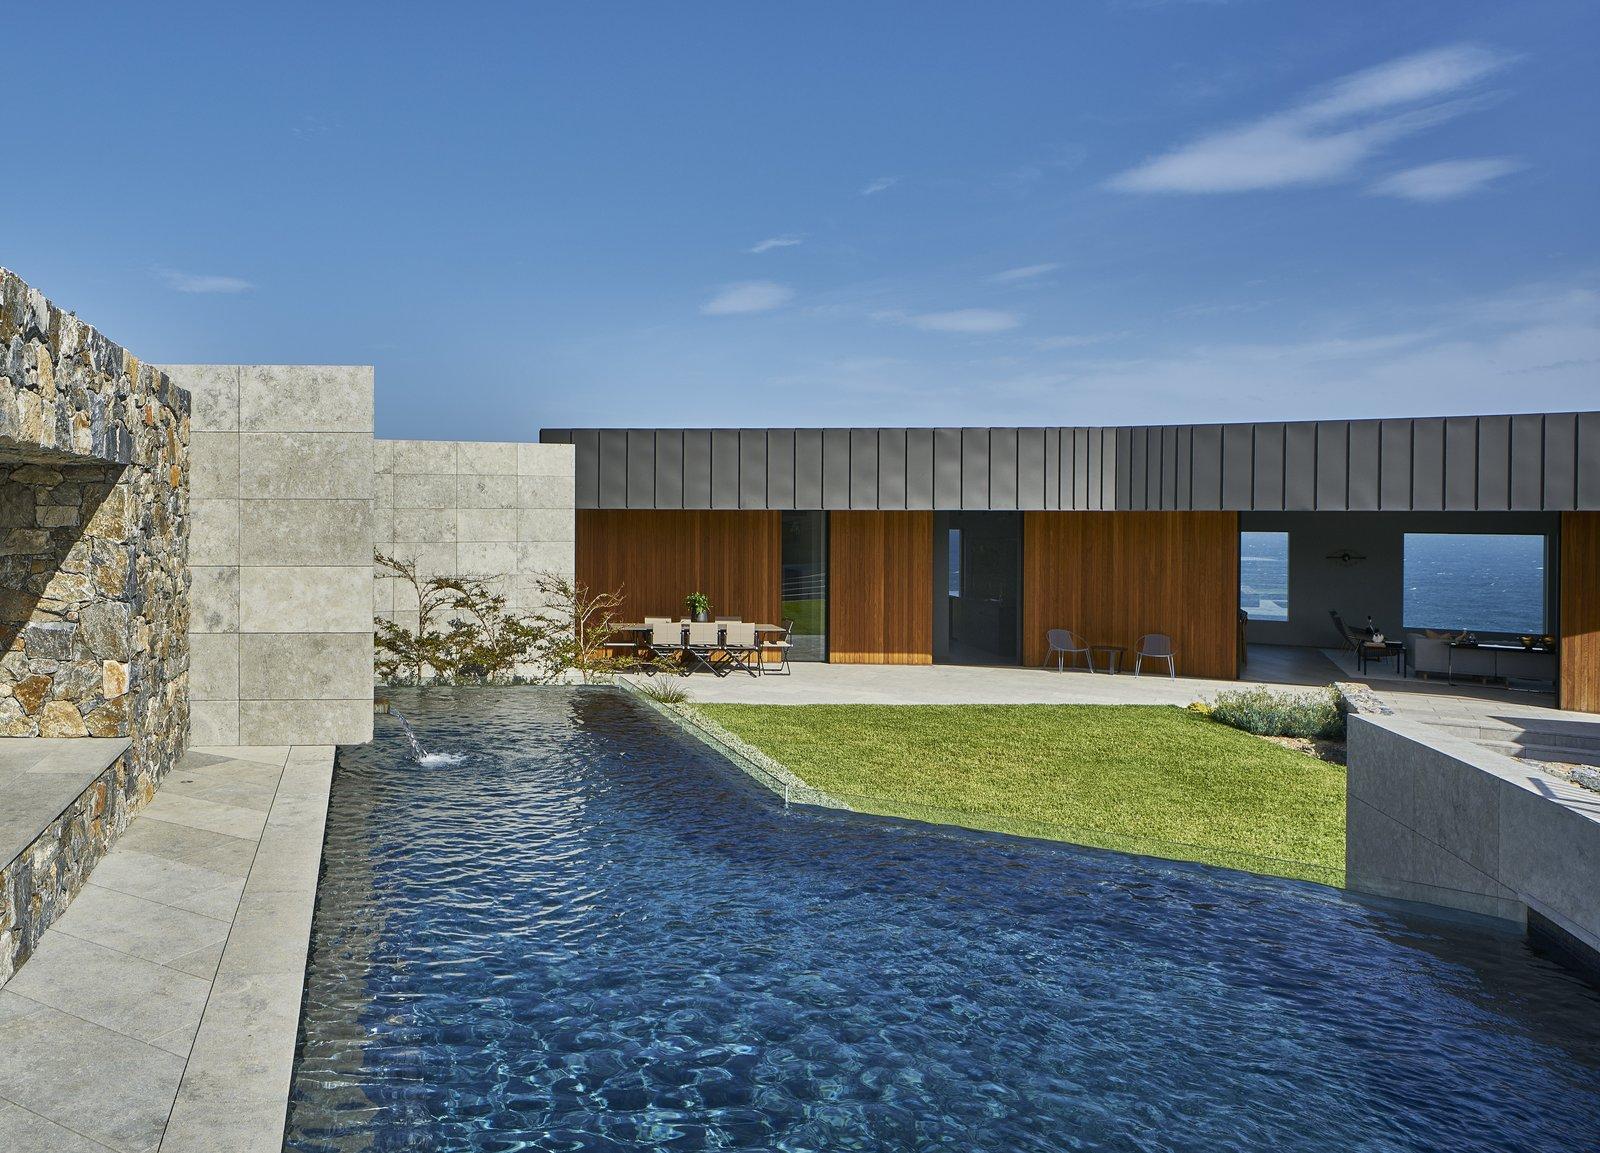 the courtyard pool - Inspirasi Desain Kolam Renang Minimalis untuk Rumah Modern, Mewah Banget!